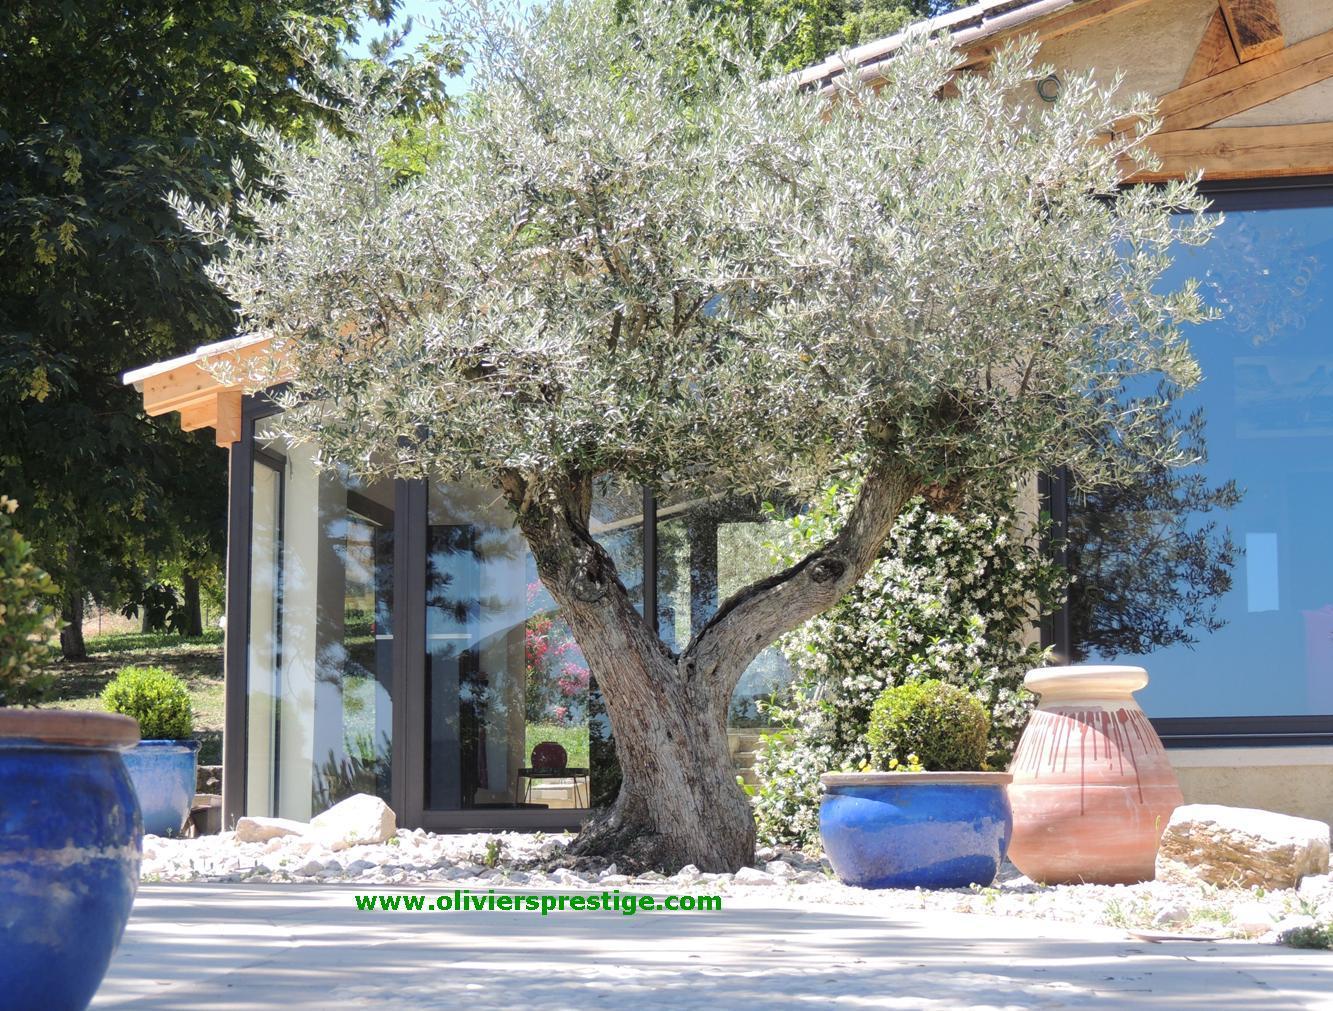 Oliviers prestige vente oliviers grand choix toutes formes for Jardin taille olivier